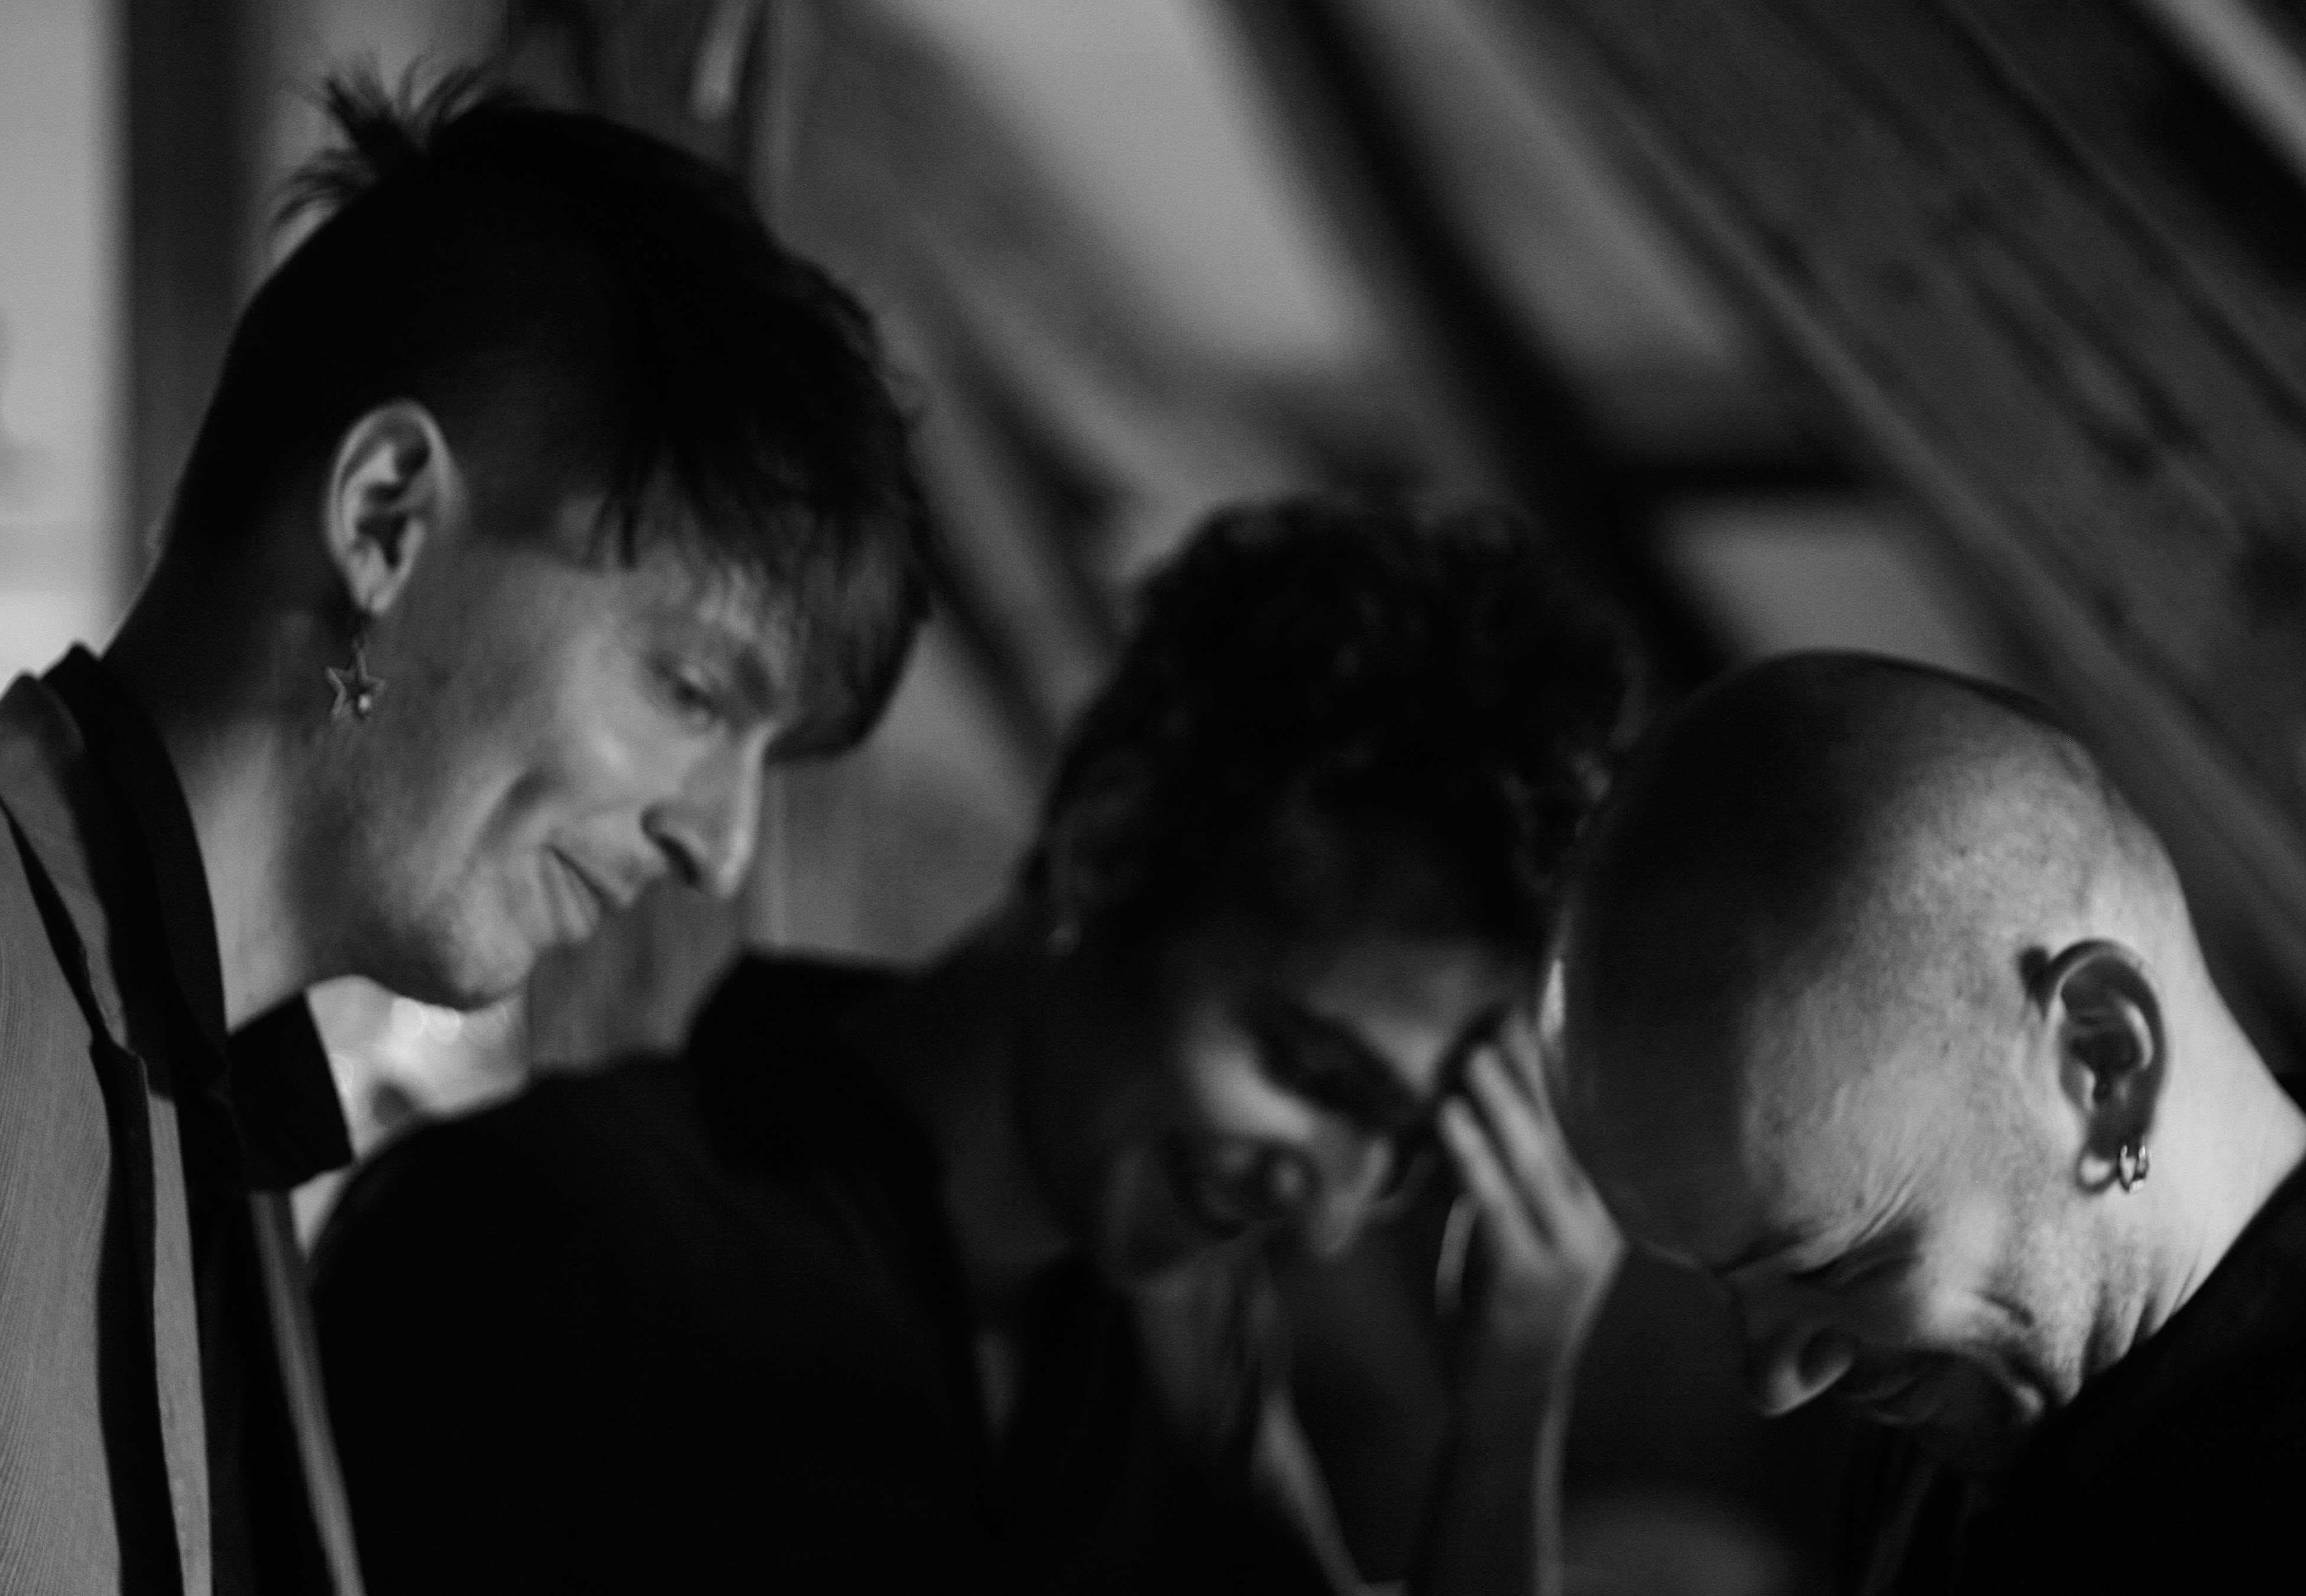 MONOZID: A Splinter For The Pure (Awake In The Greylight 2012)